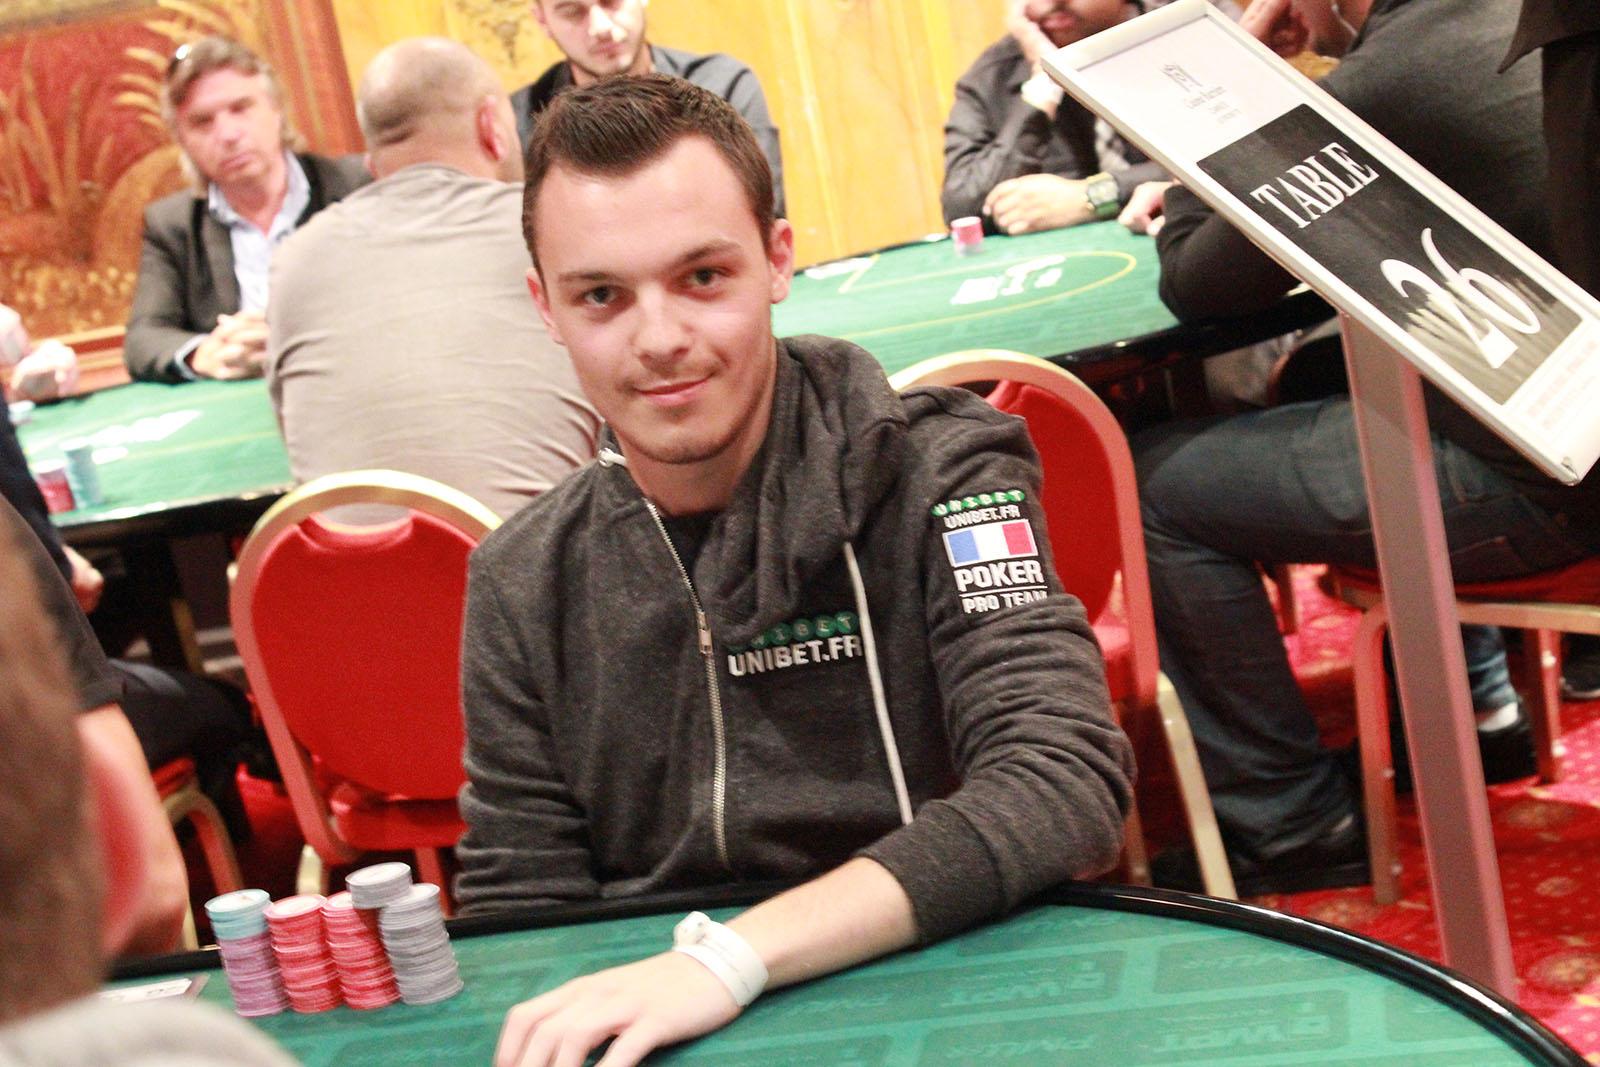 Blog Poker de PMU Poker, suivez le coverage de la Team Pro PMU Poker ...